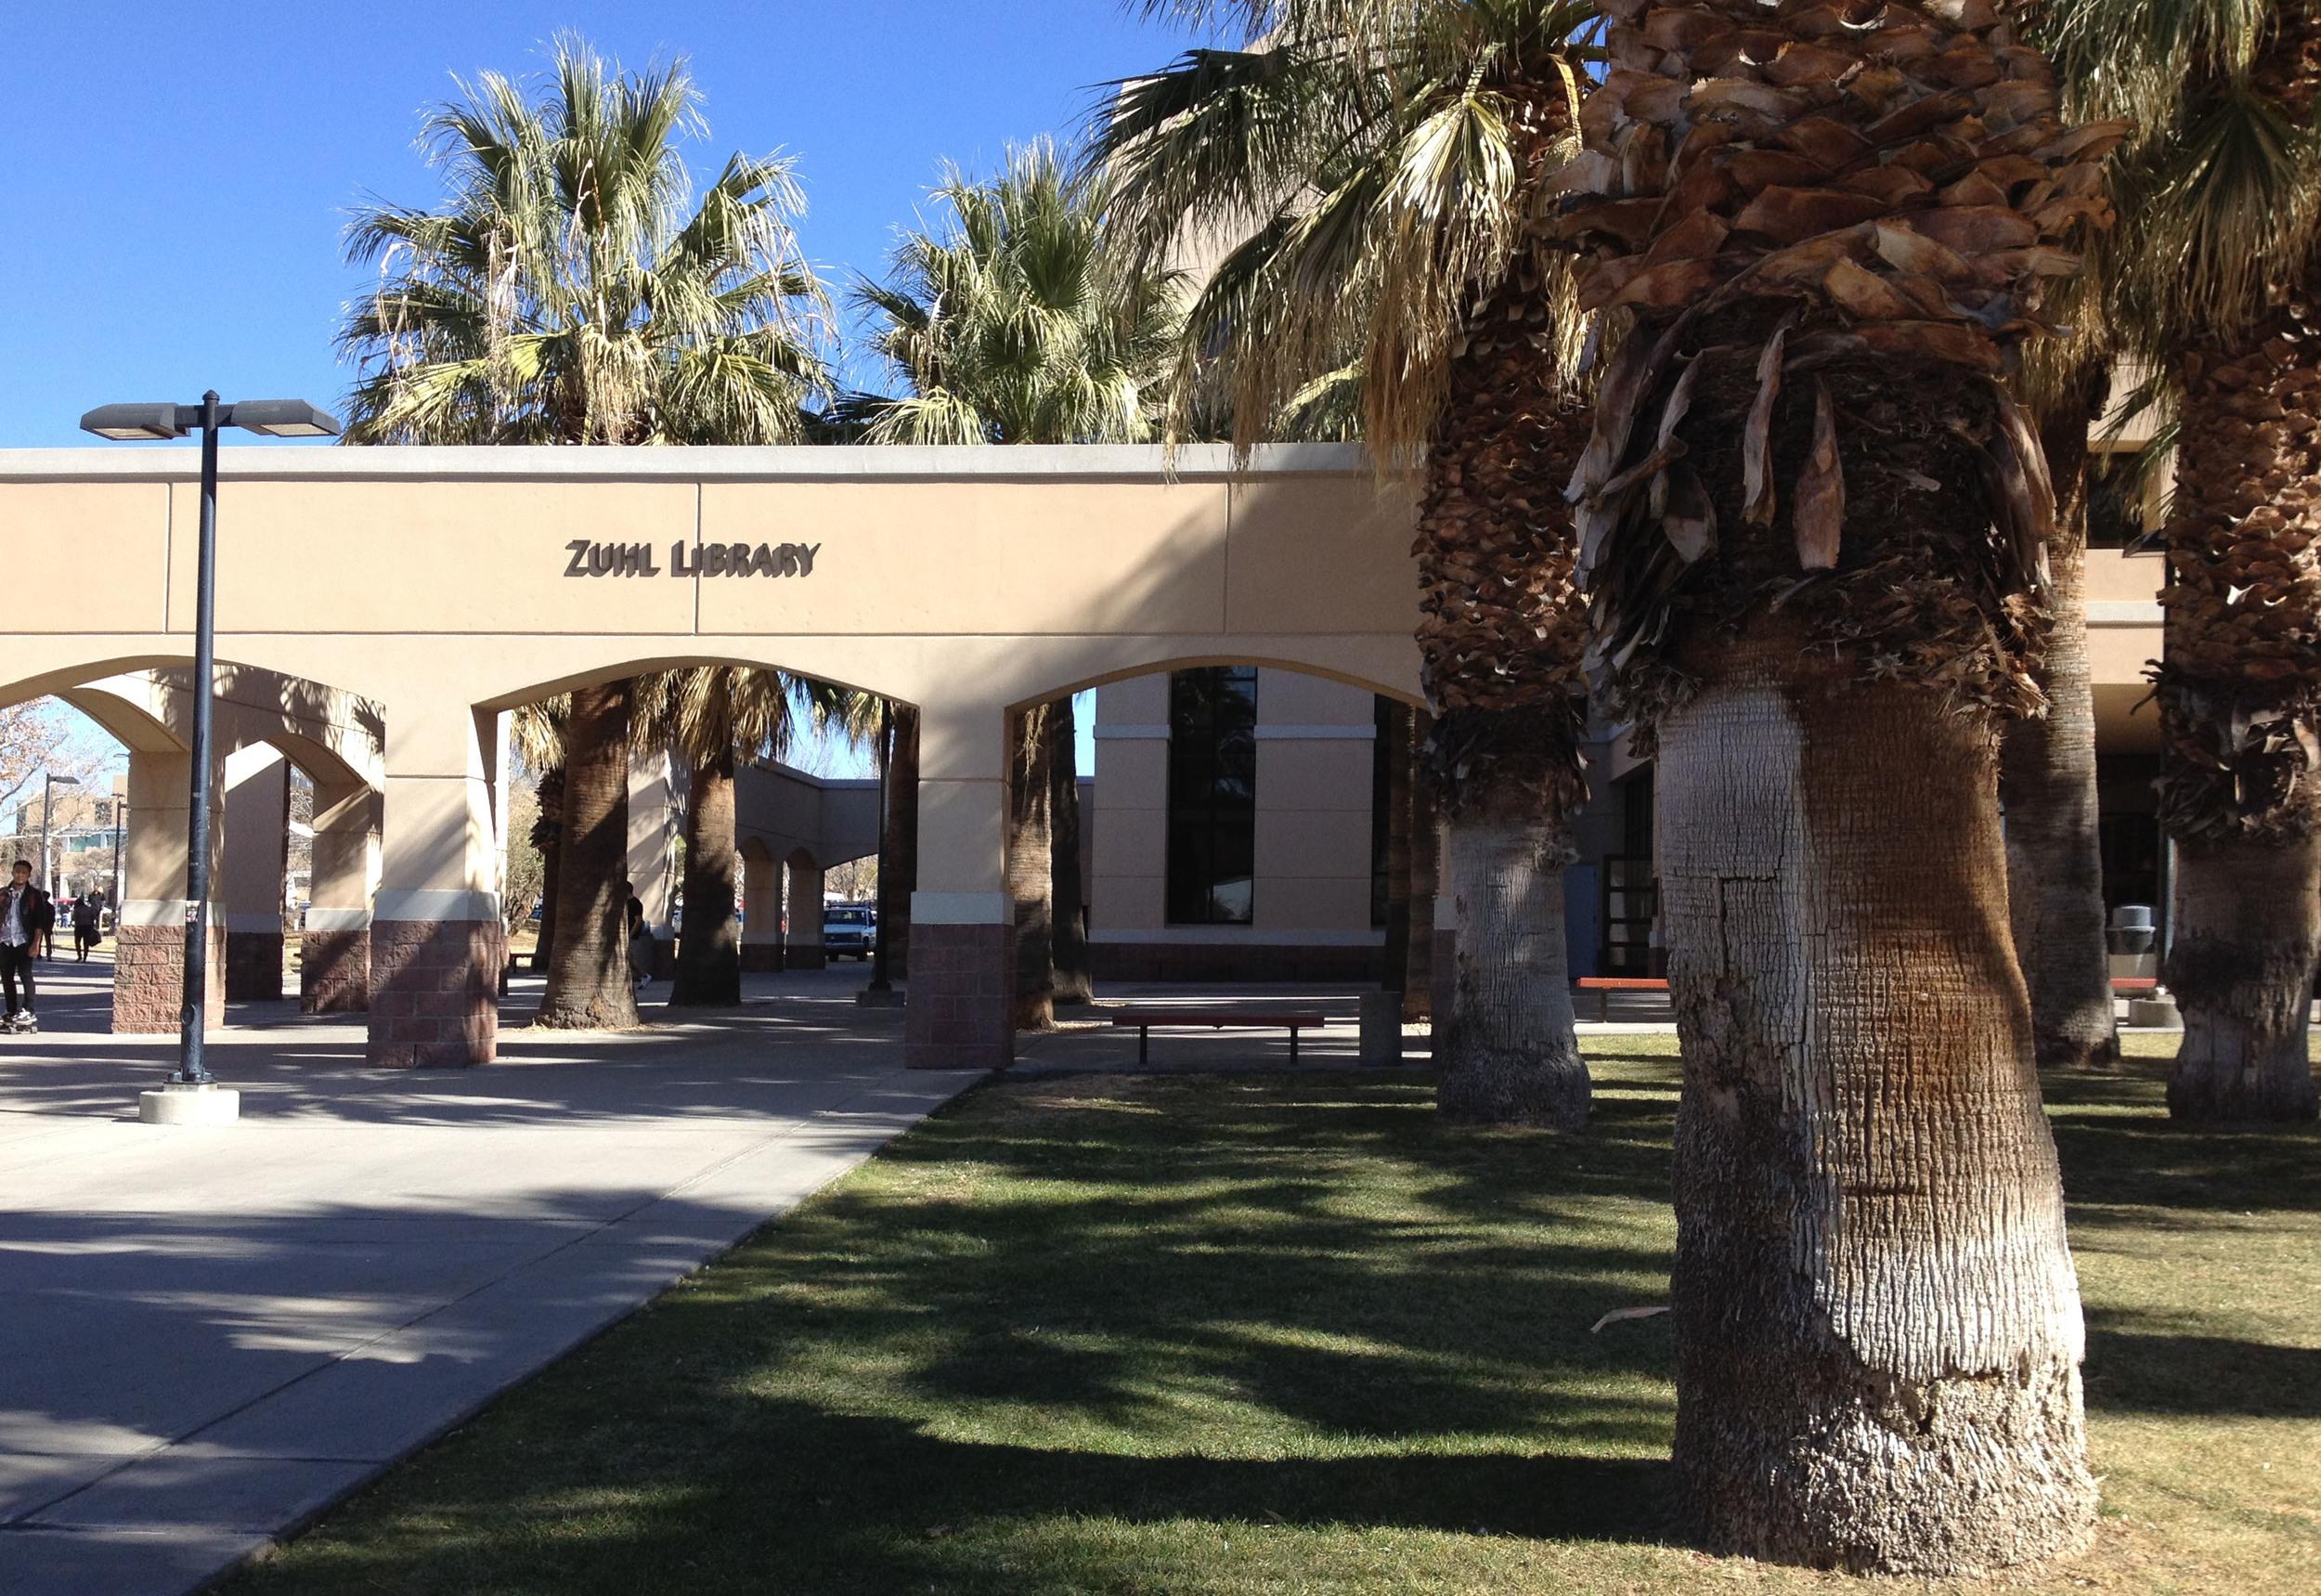 Palms provide shade along entry path